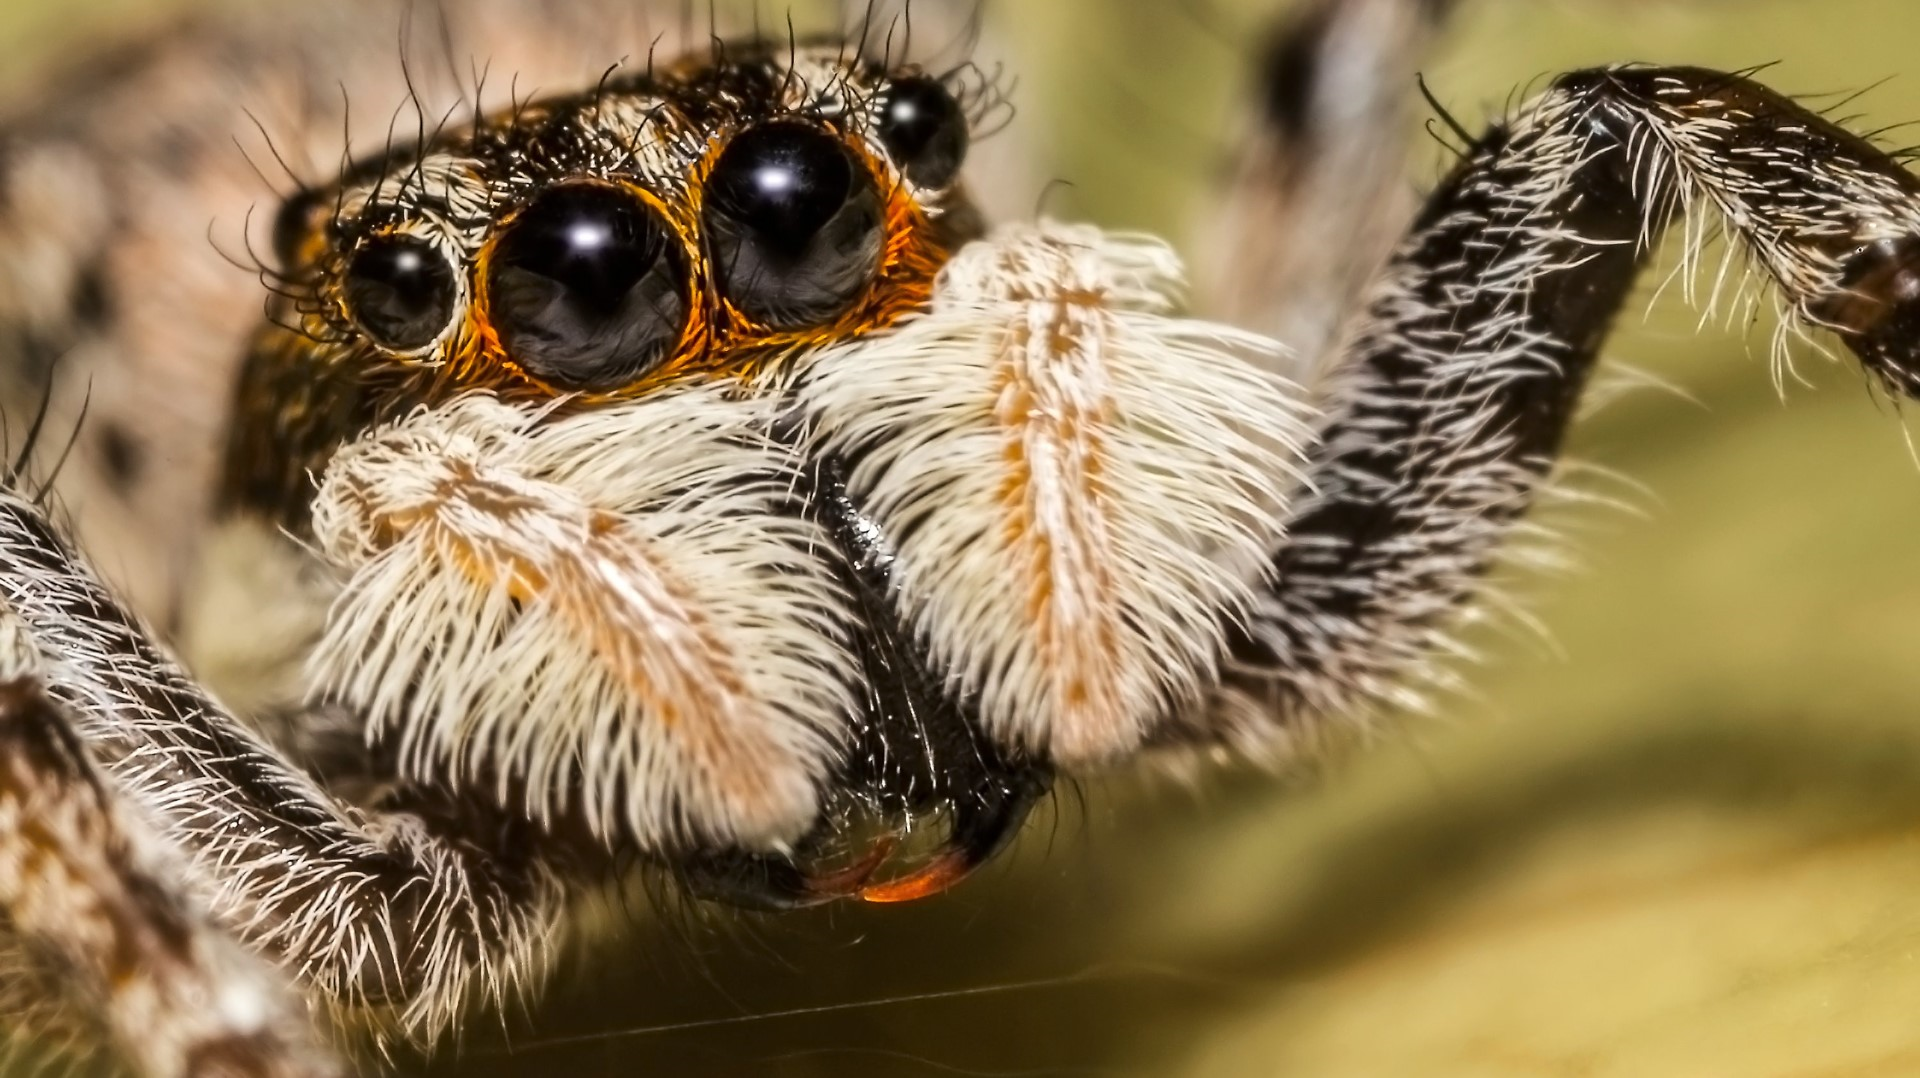 Earthquake Tracker San Diego >> kgw.com | New 'softball-sized' spider species found in Baja California caves